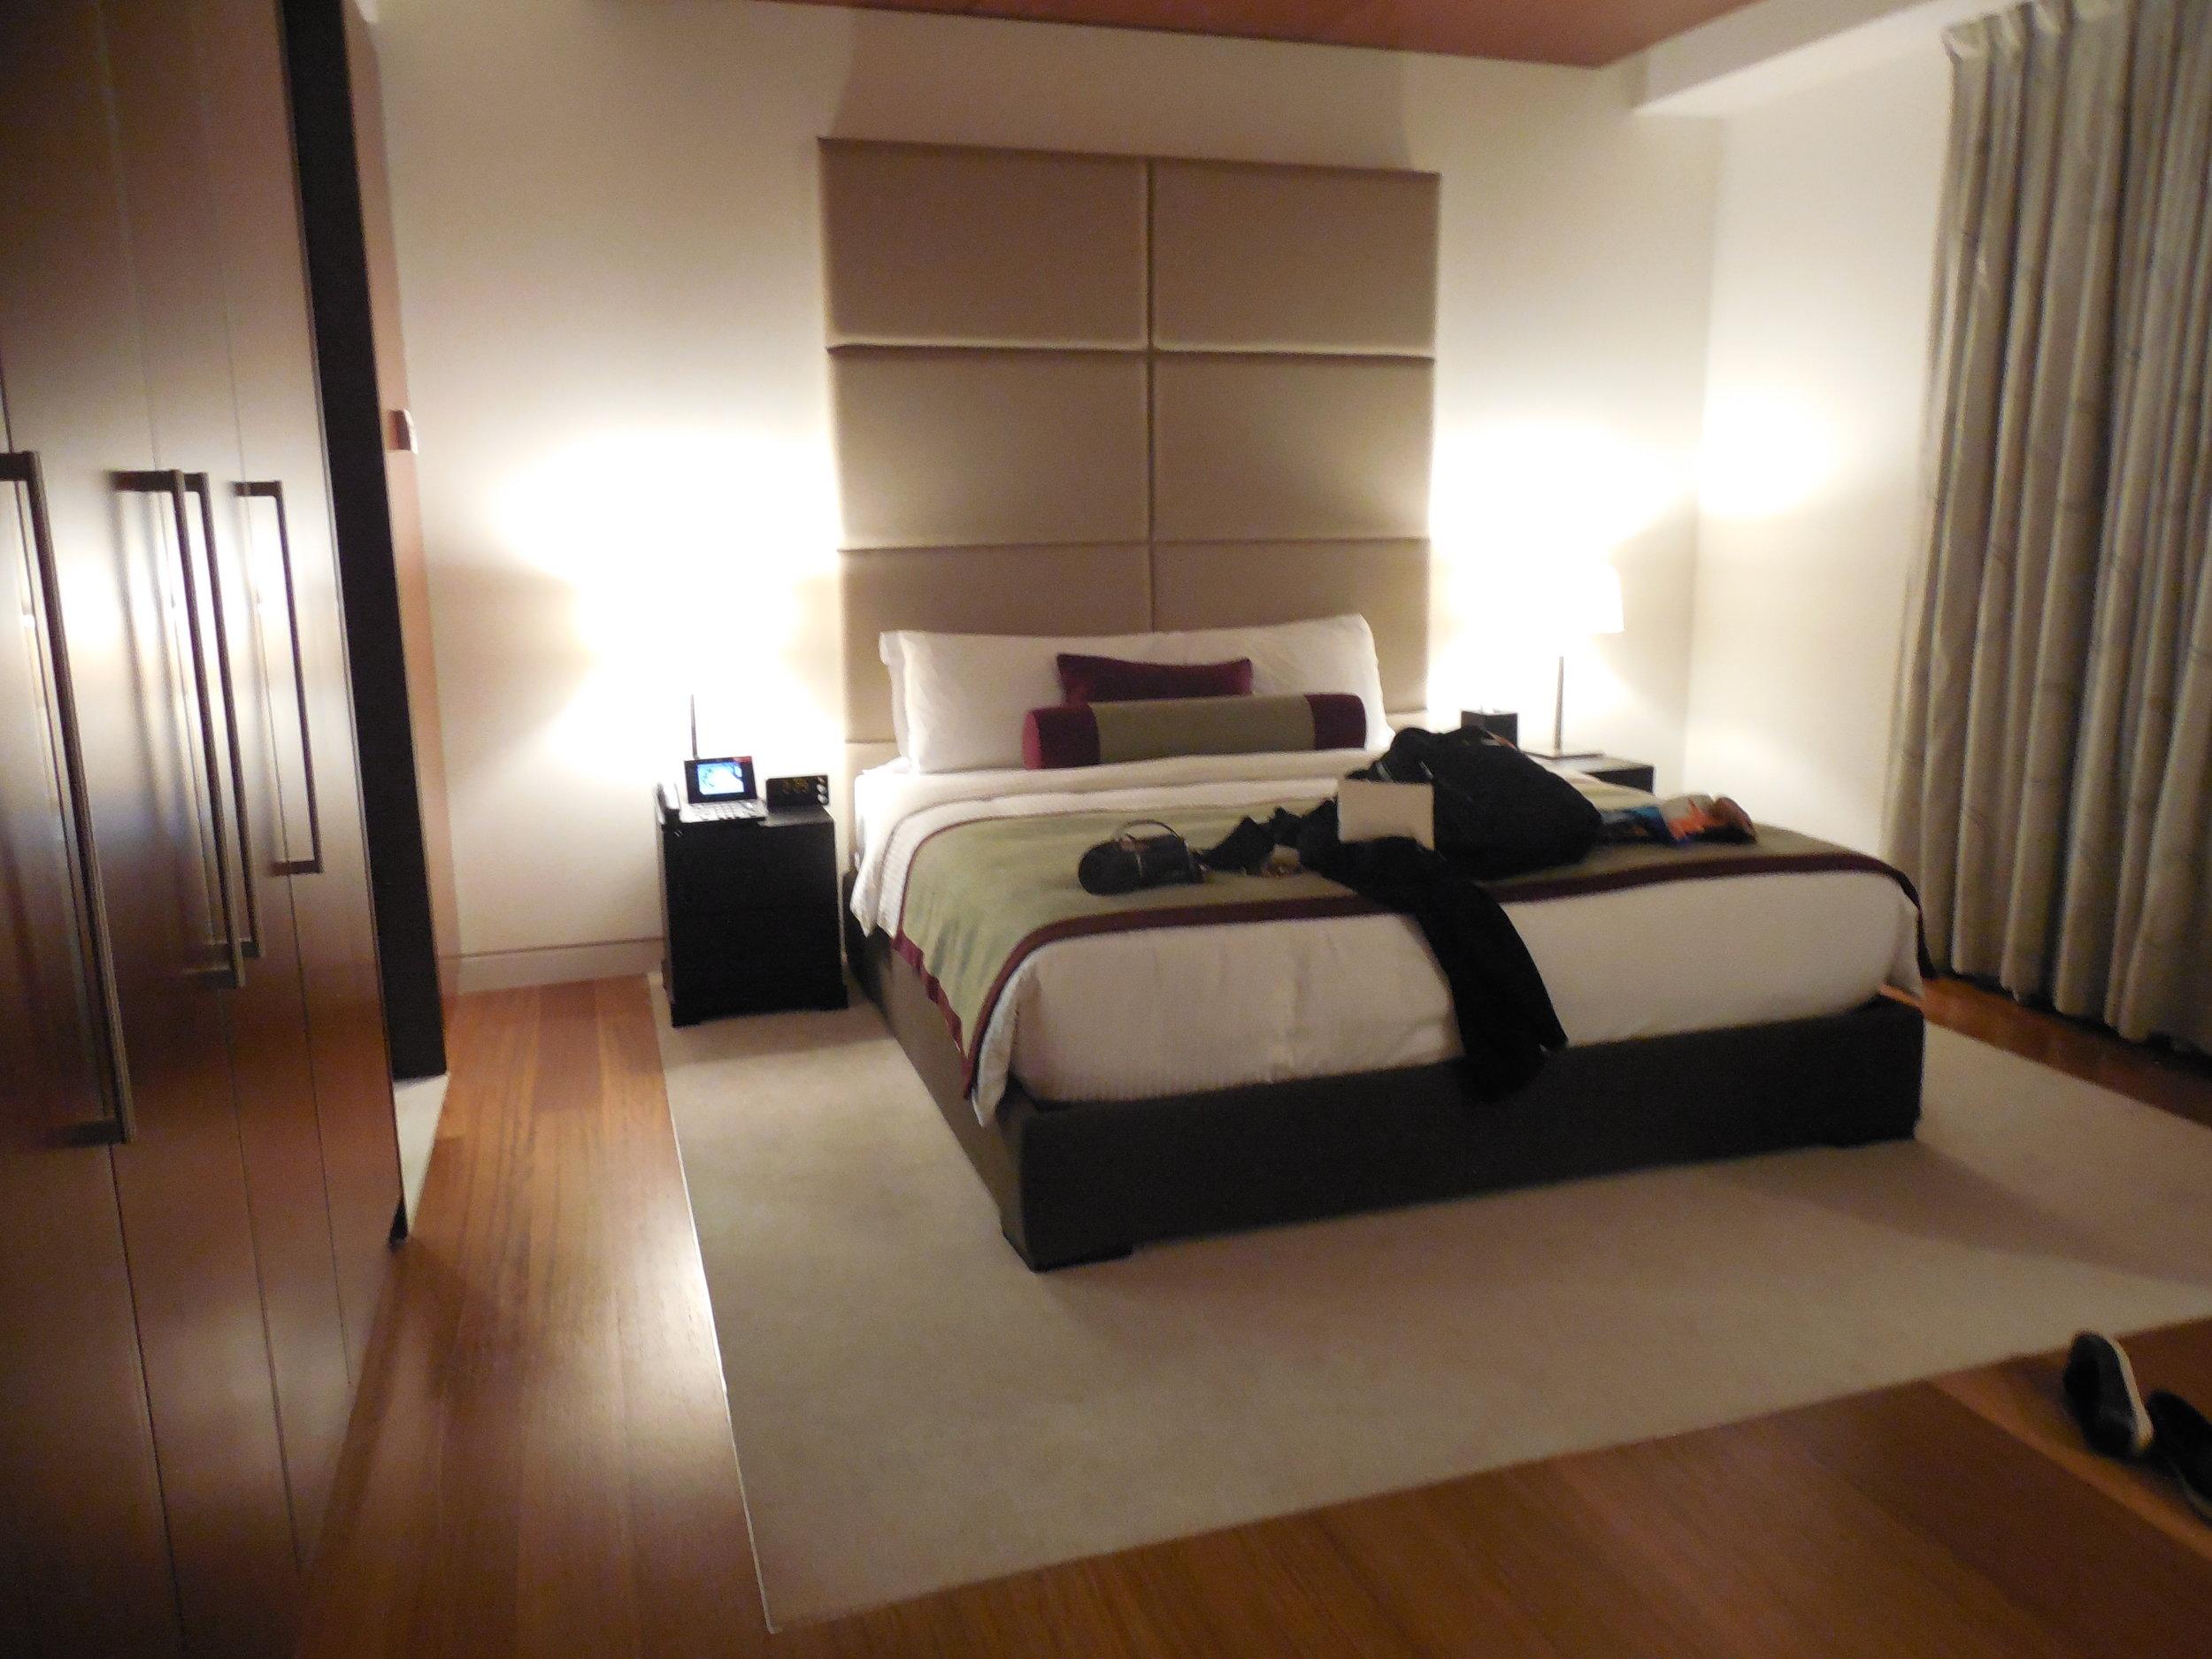 Suite Bedroom Oryx Airport Hotel © Flyga Twiga LLC